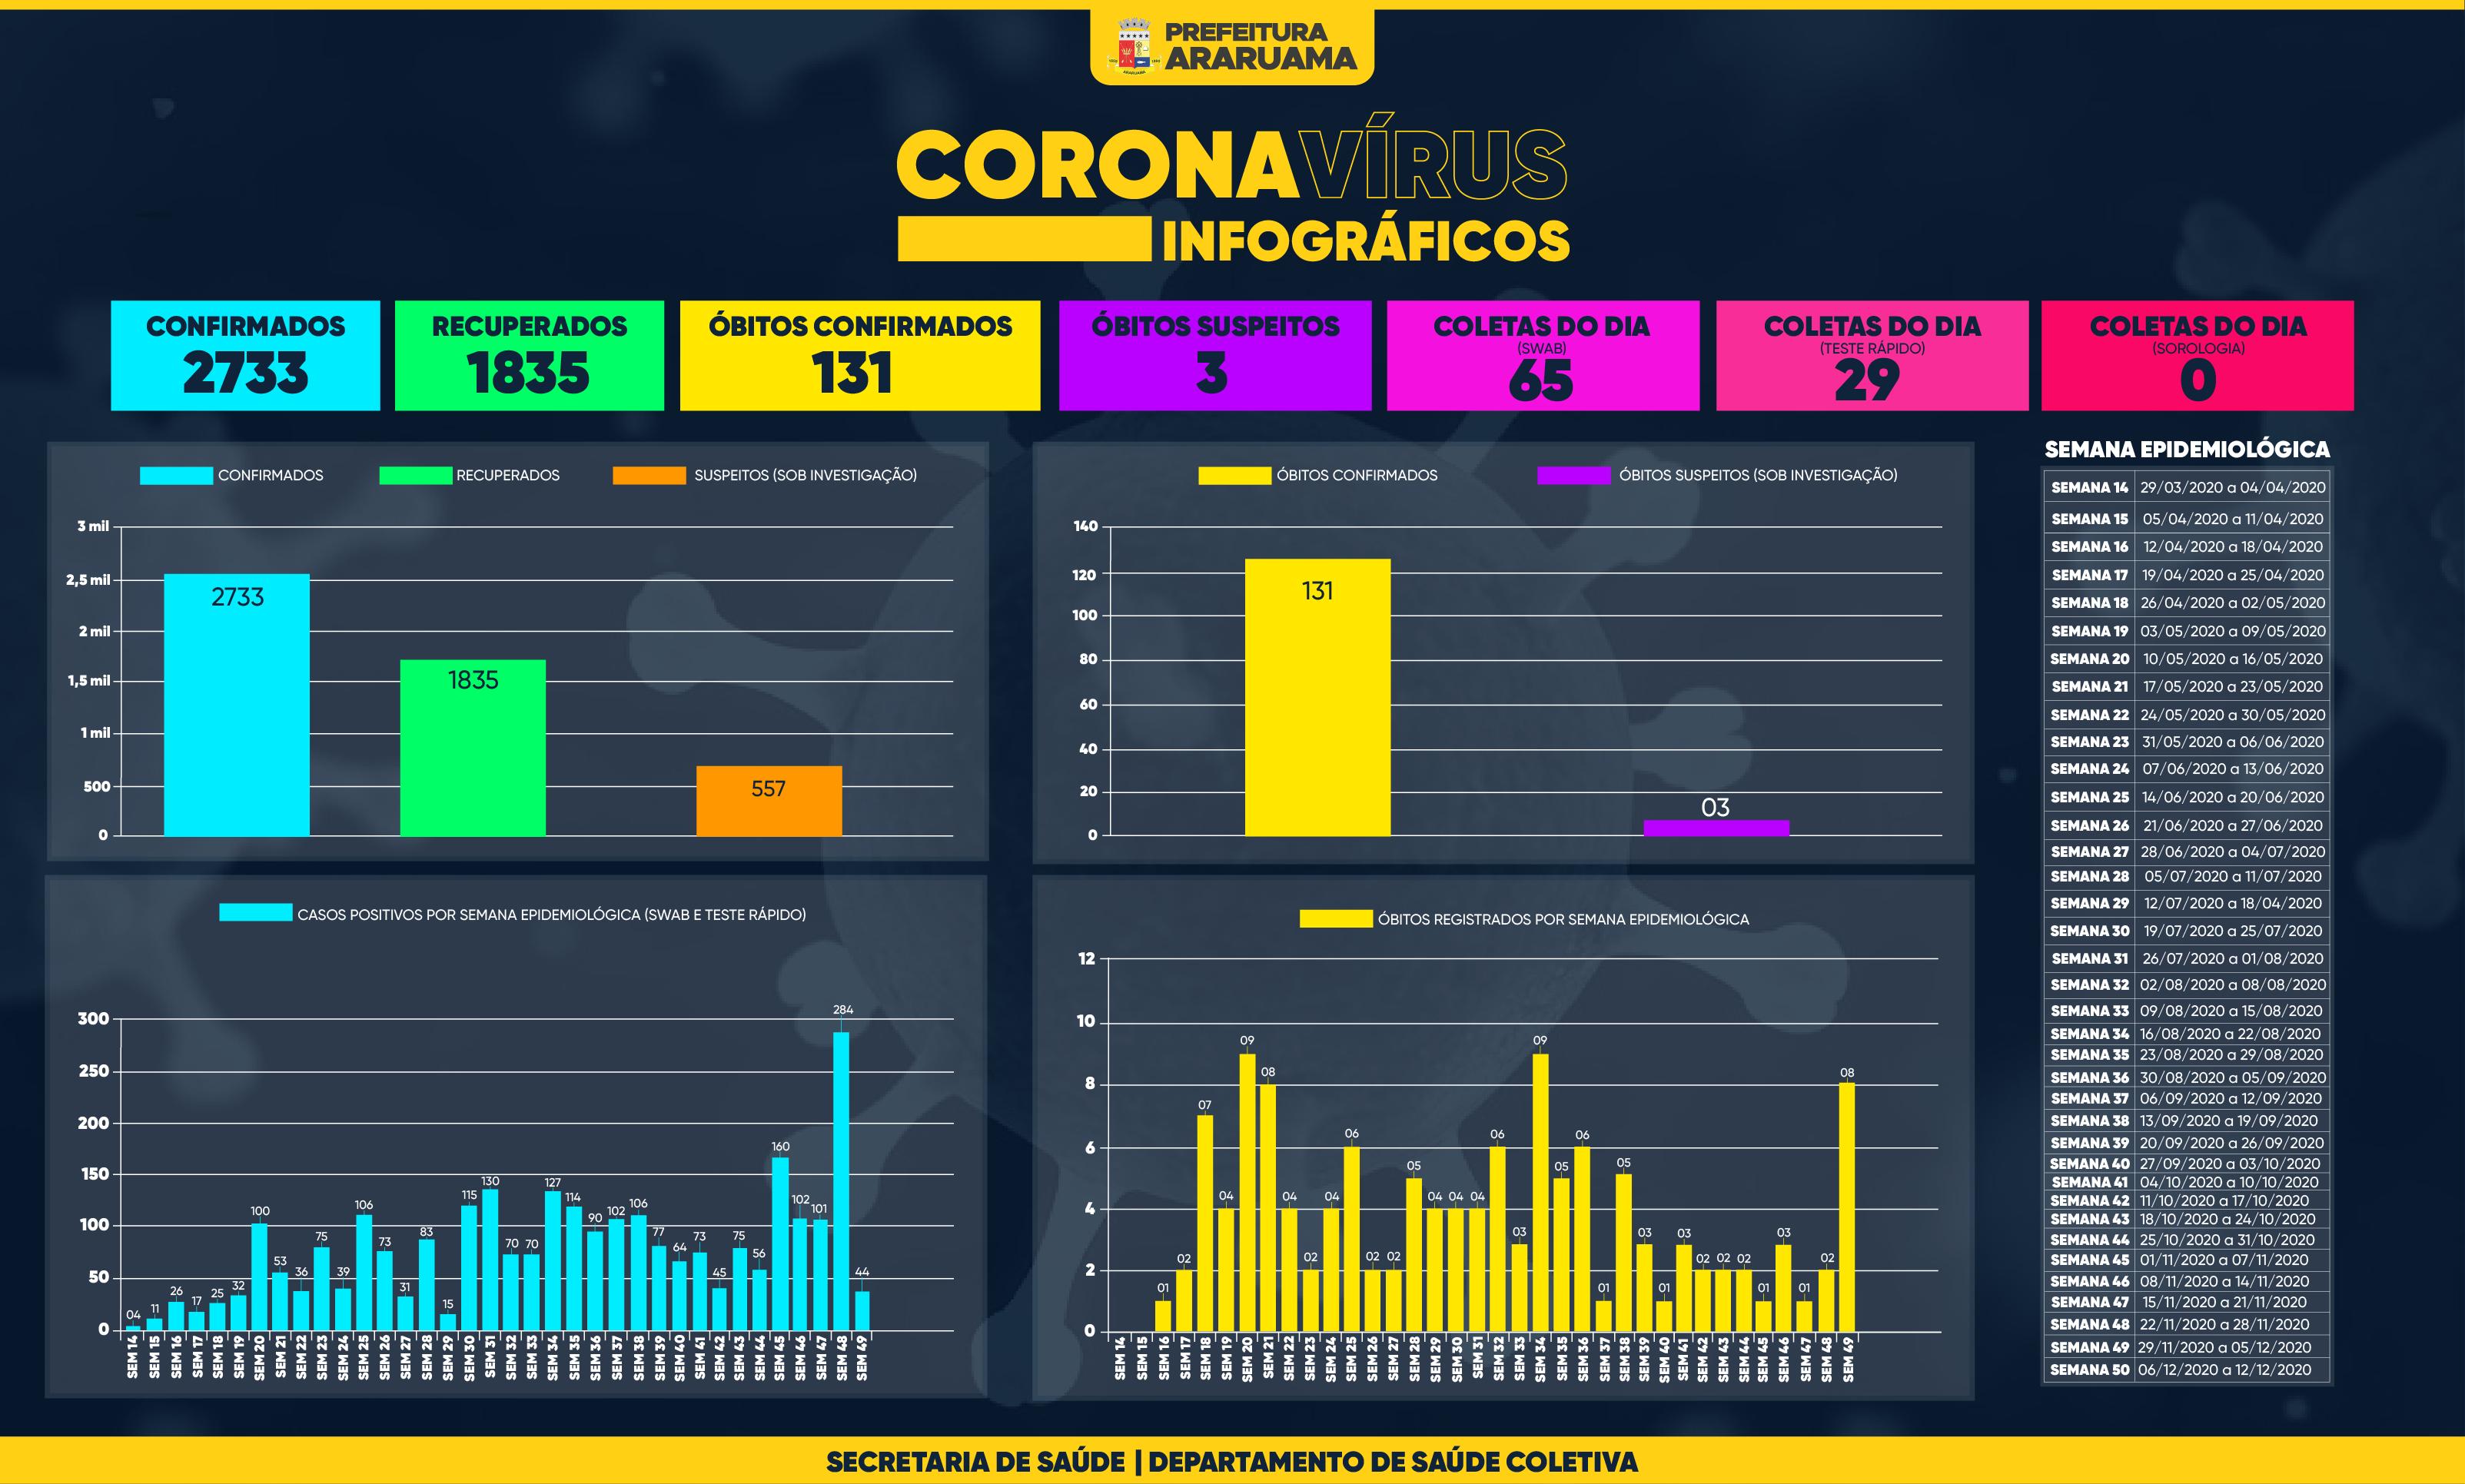 Painel de Monitoramento COVID-19 — Semana 50 — 07 de dezembro de 2020